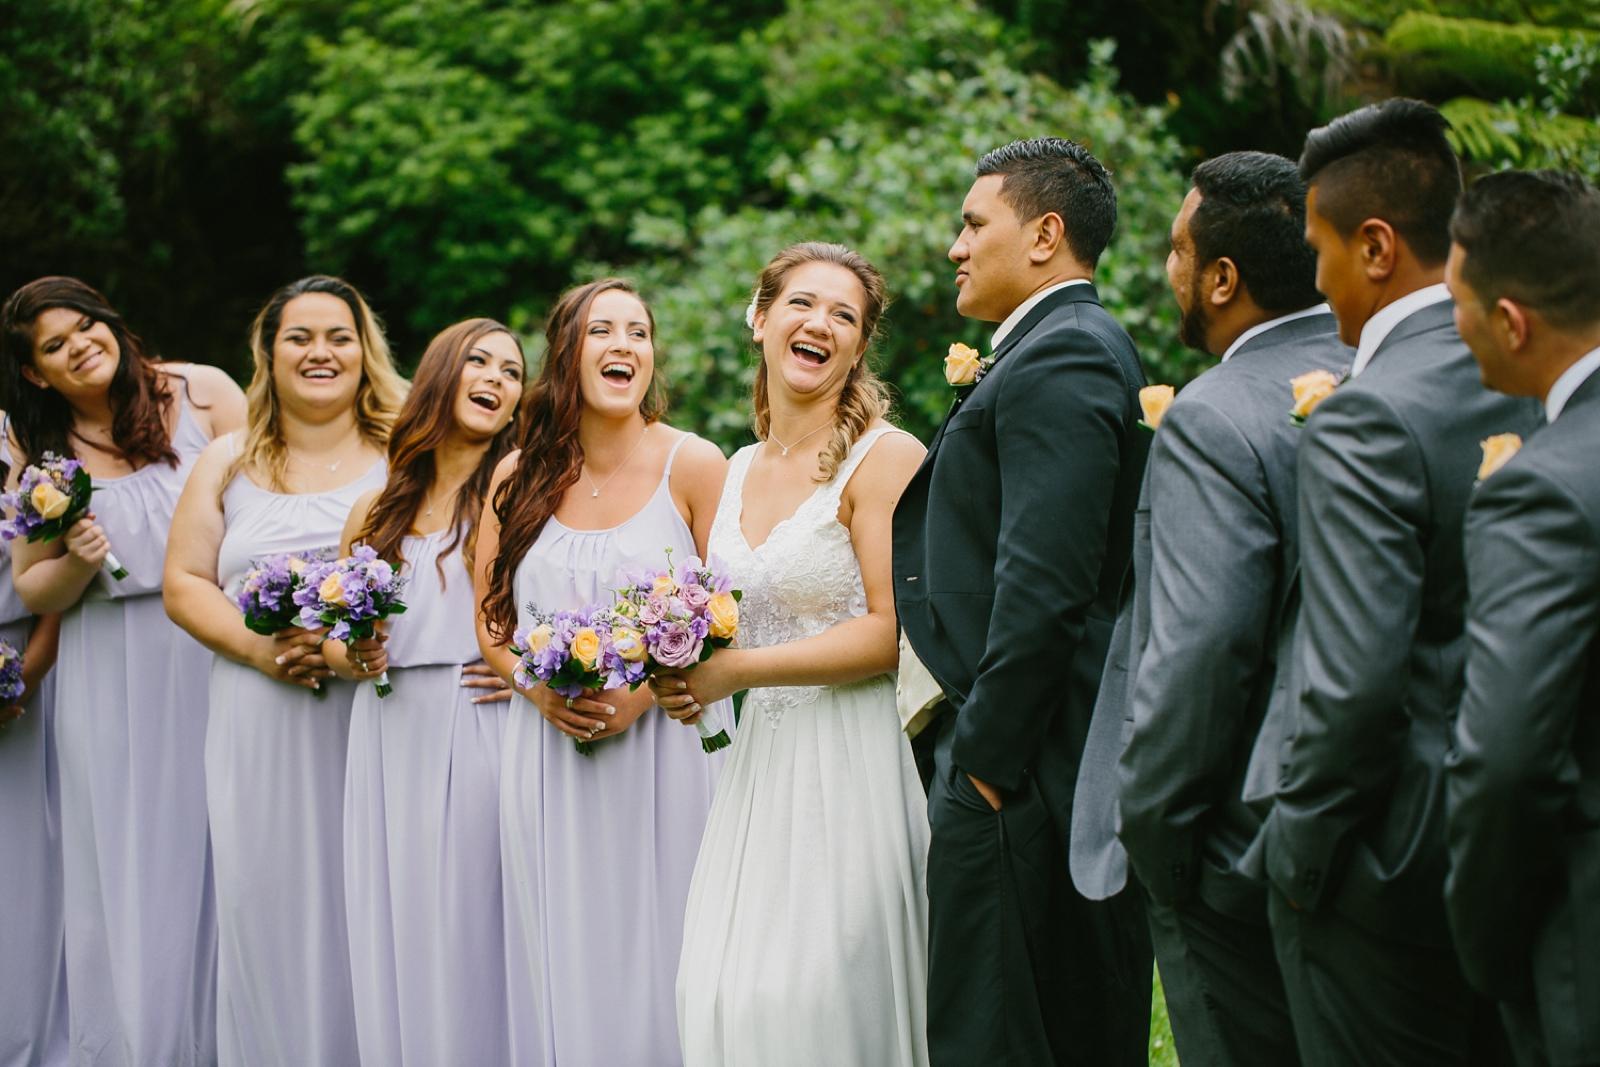 GabbyFiti_Auckland Wedding Photographer_Patty Lagera_0039.jpg